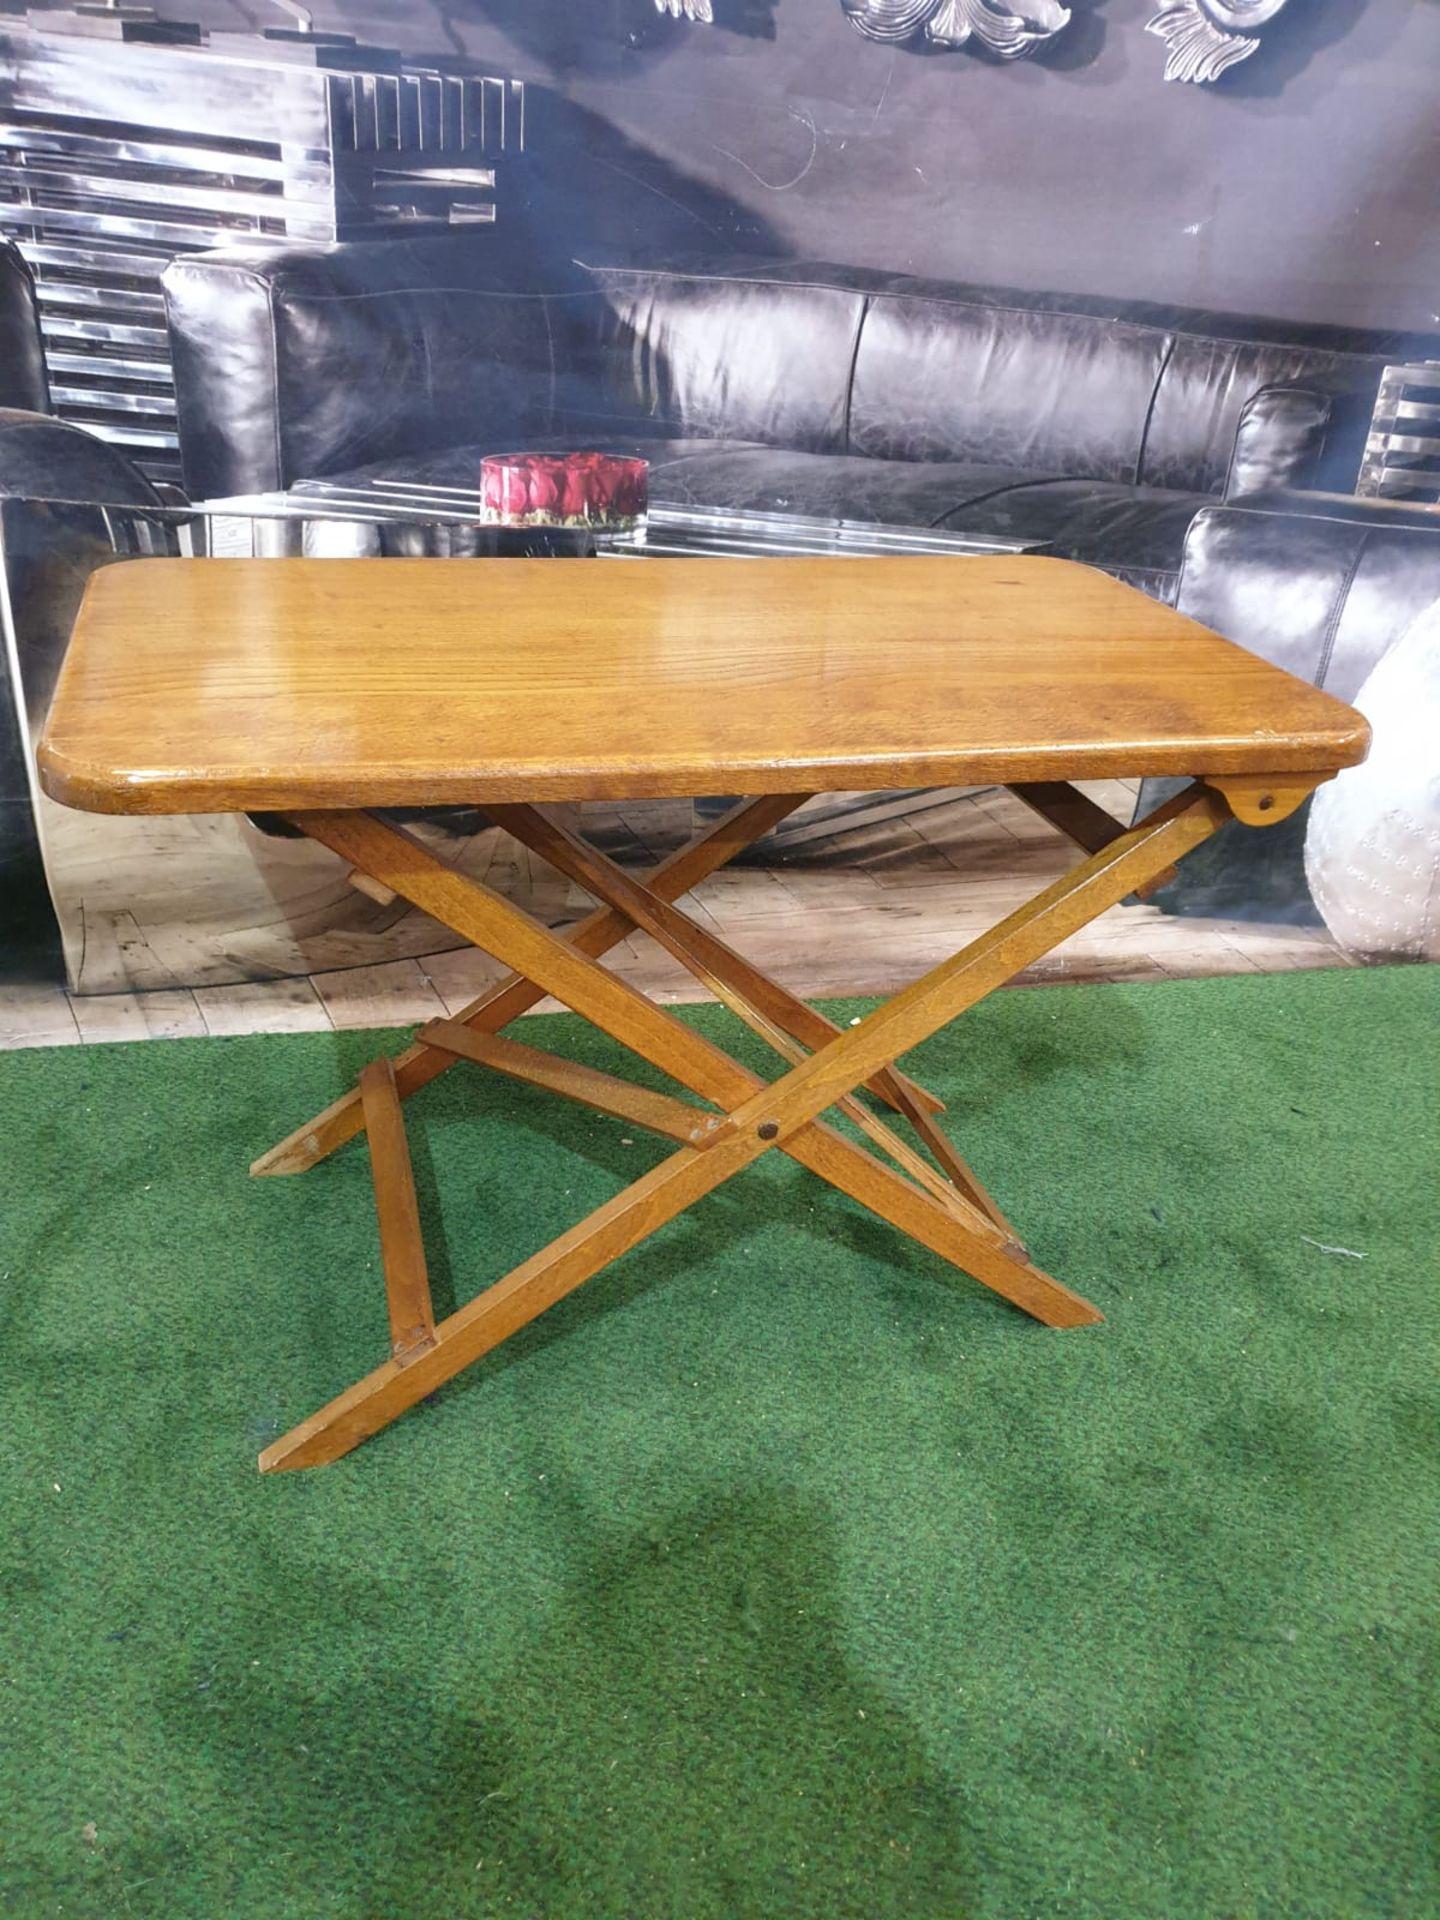 A polished teak folding table 71 x 40 x 4cm